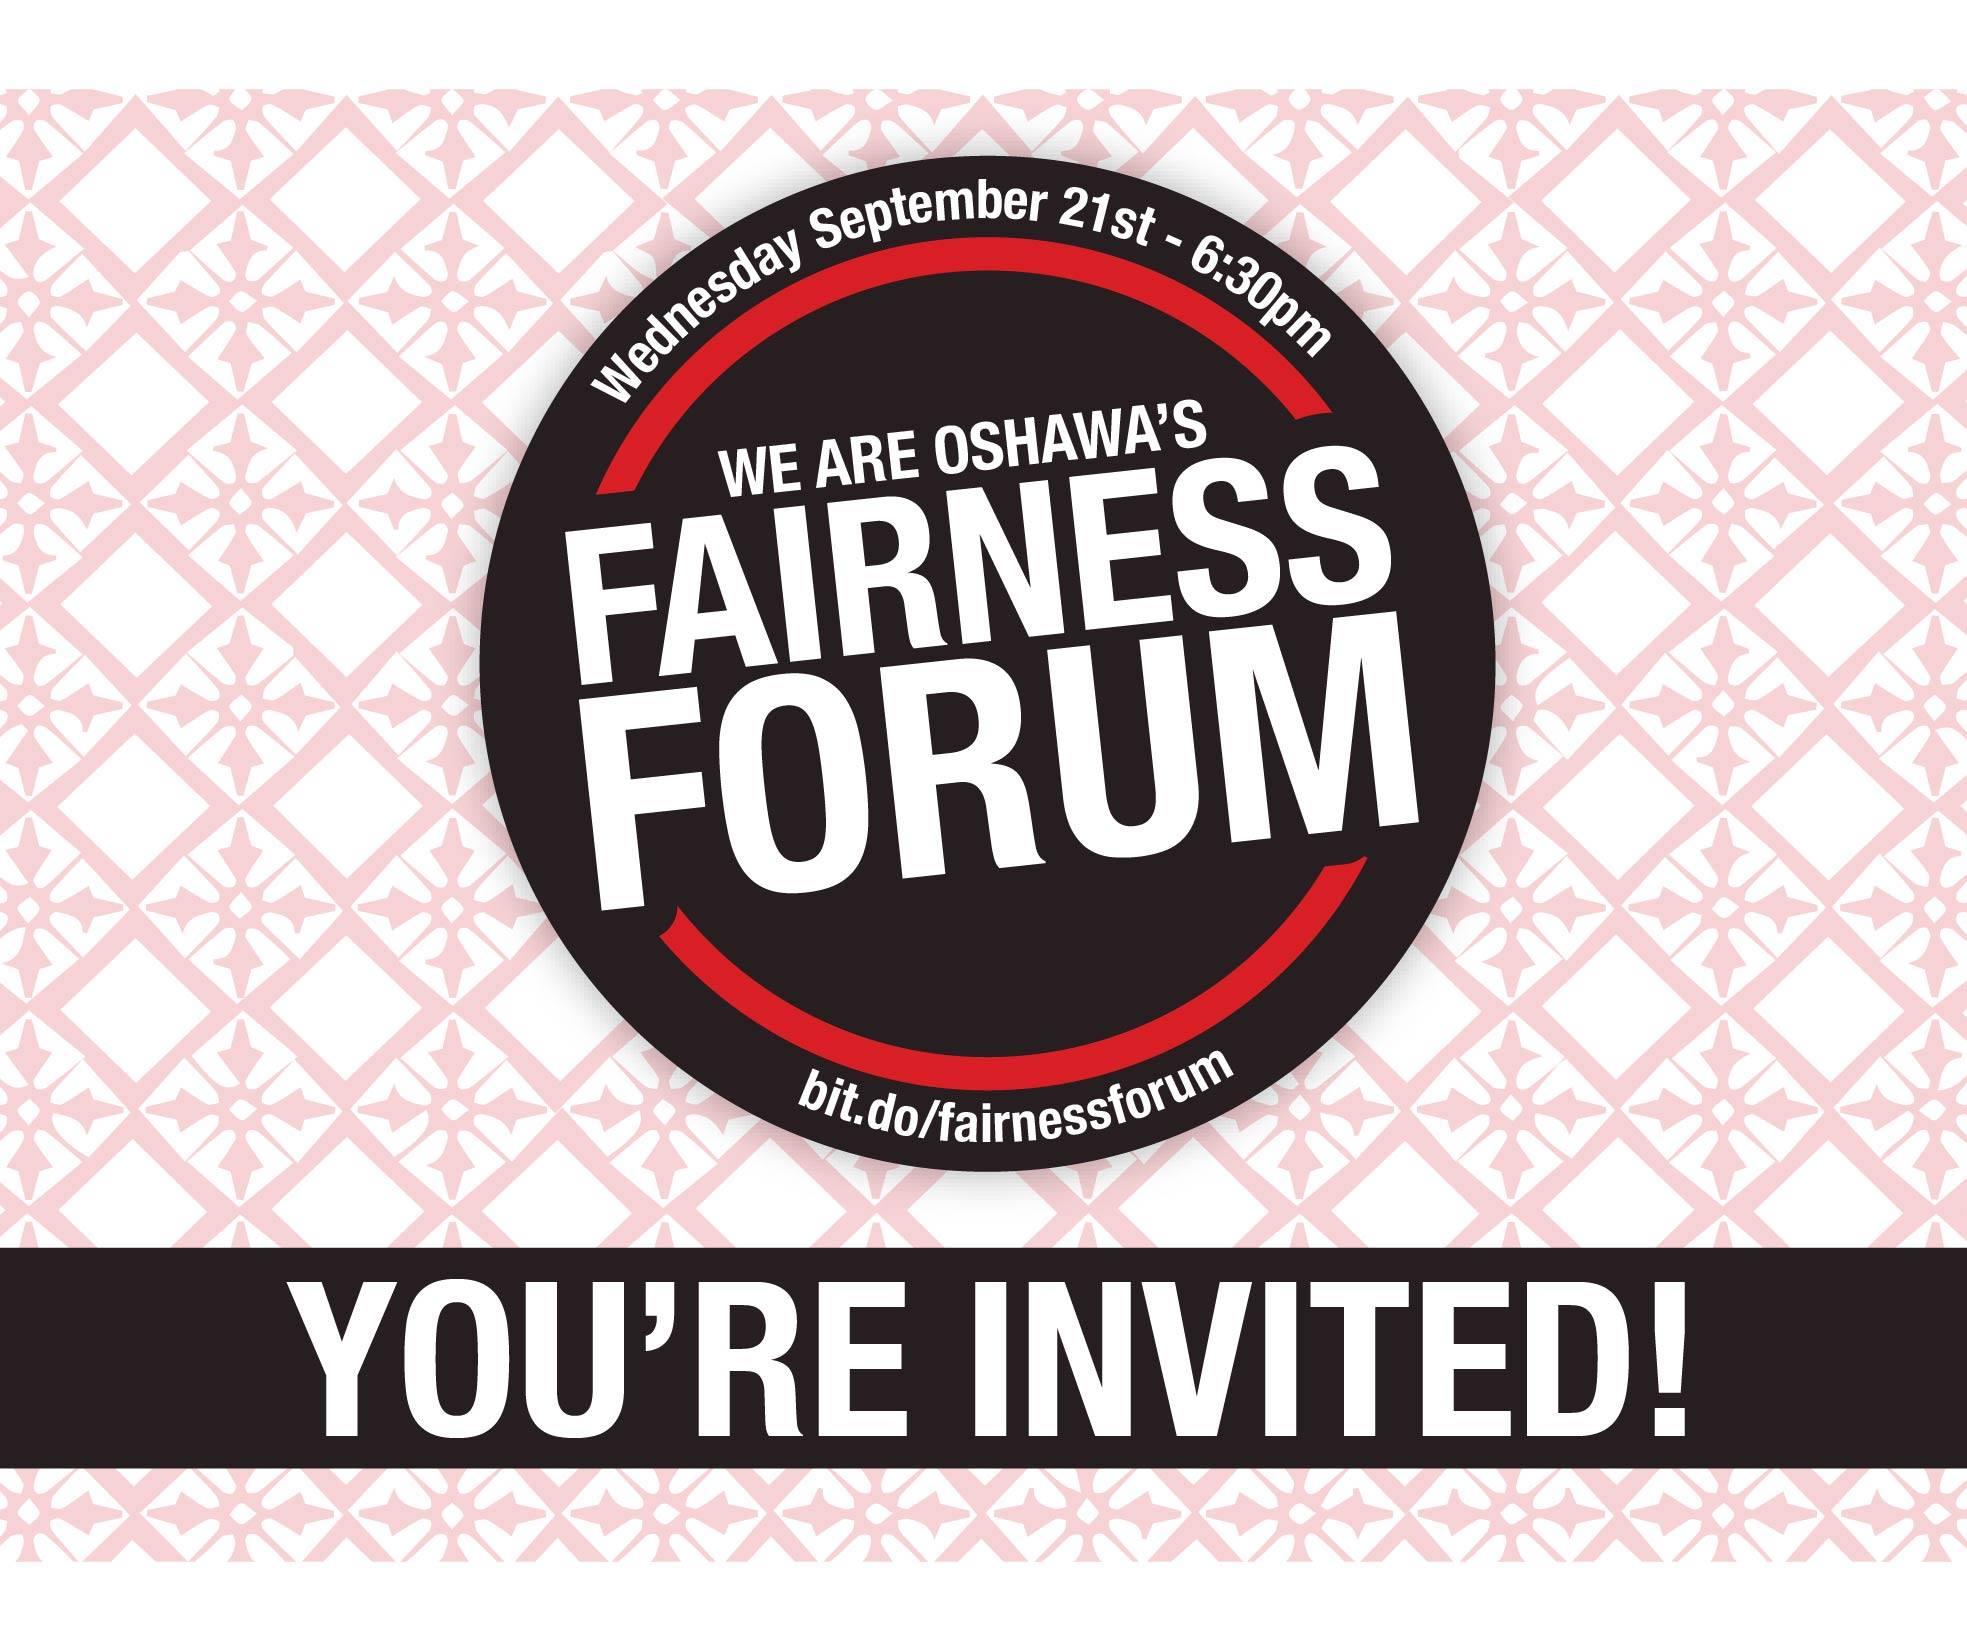 FF_Invite.jpg